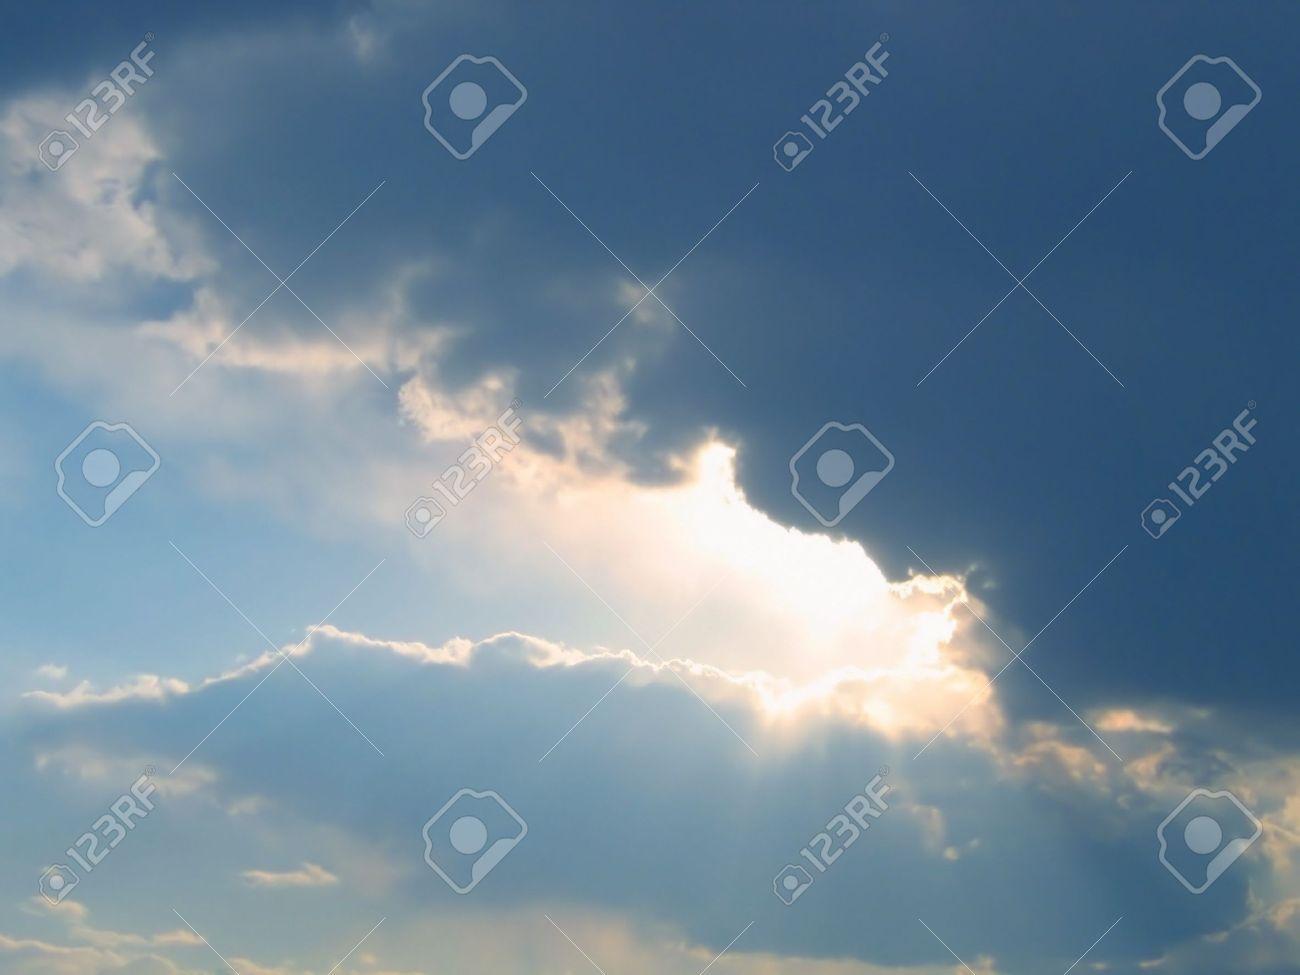 rain cloud and rays of sunlight - 14292390